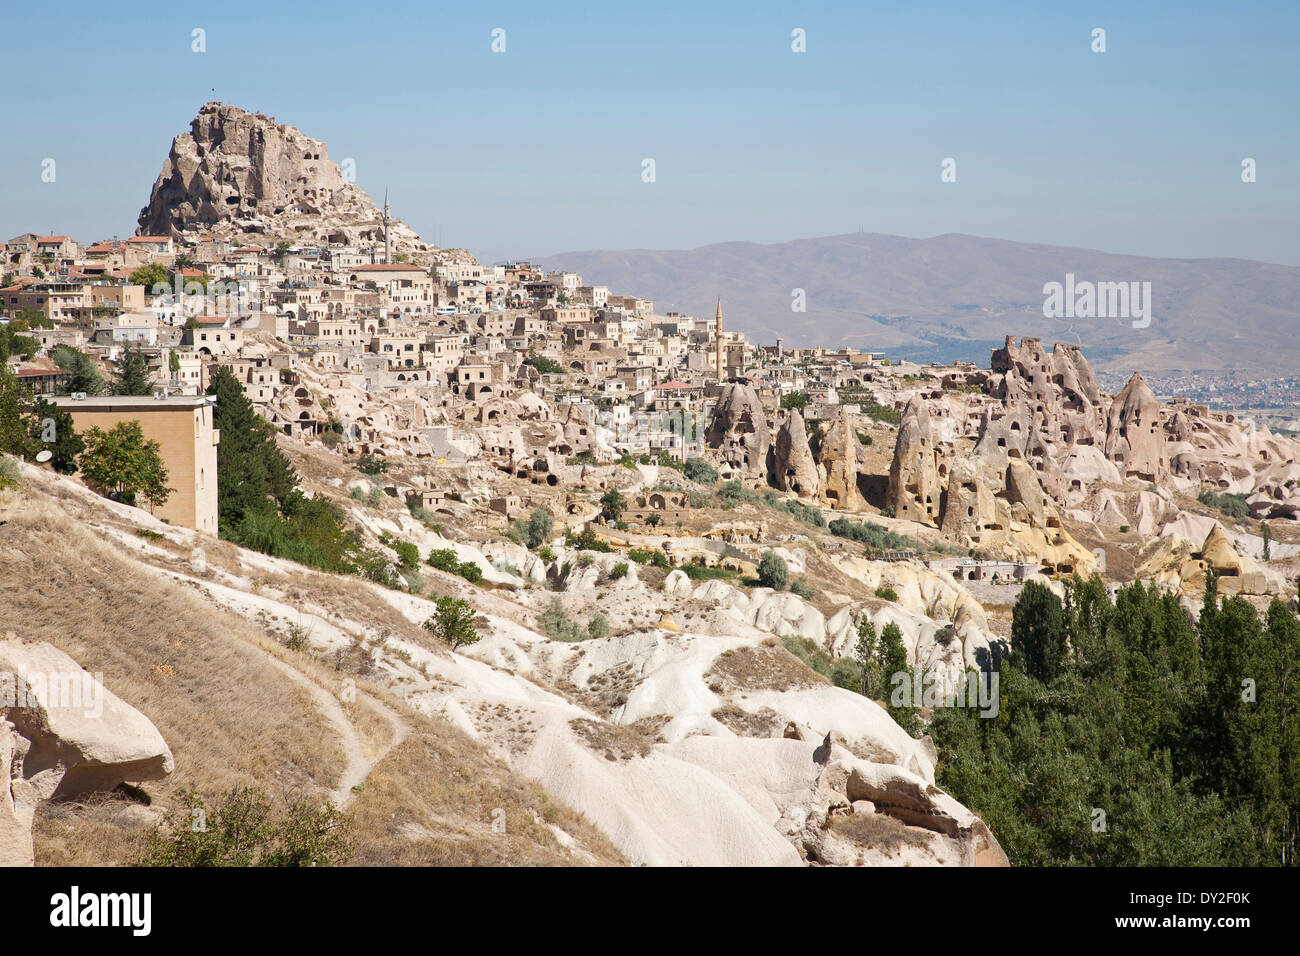 landscape and uchisar village, cappadocia, anatolia, turkey, asia - Stock Image